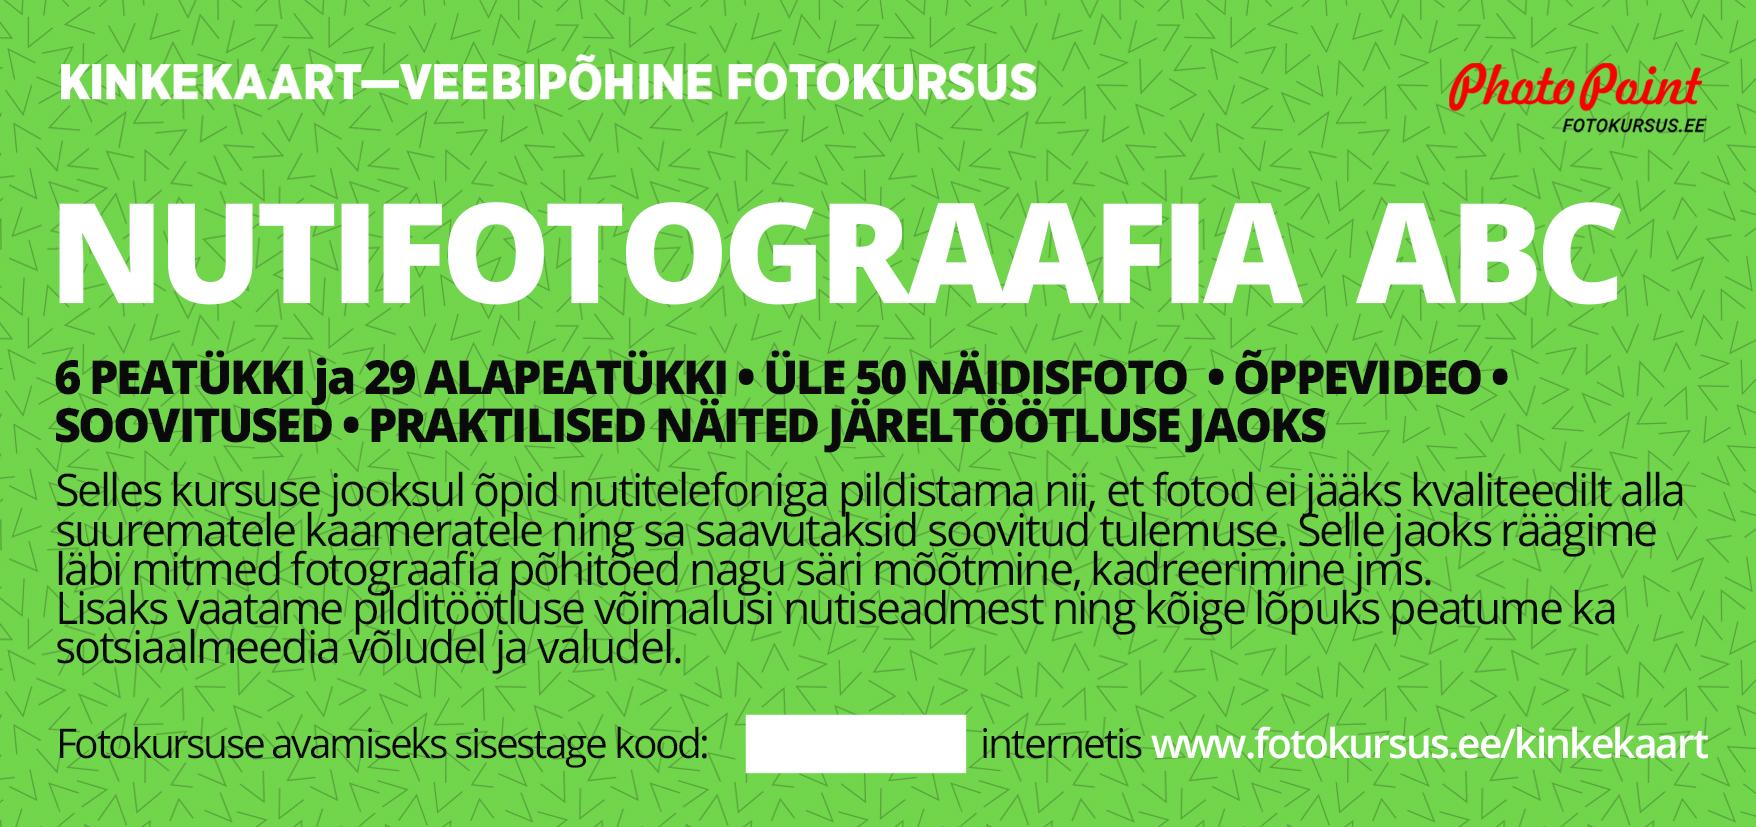 0f5bbed45fc Nutifotograafia ABC